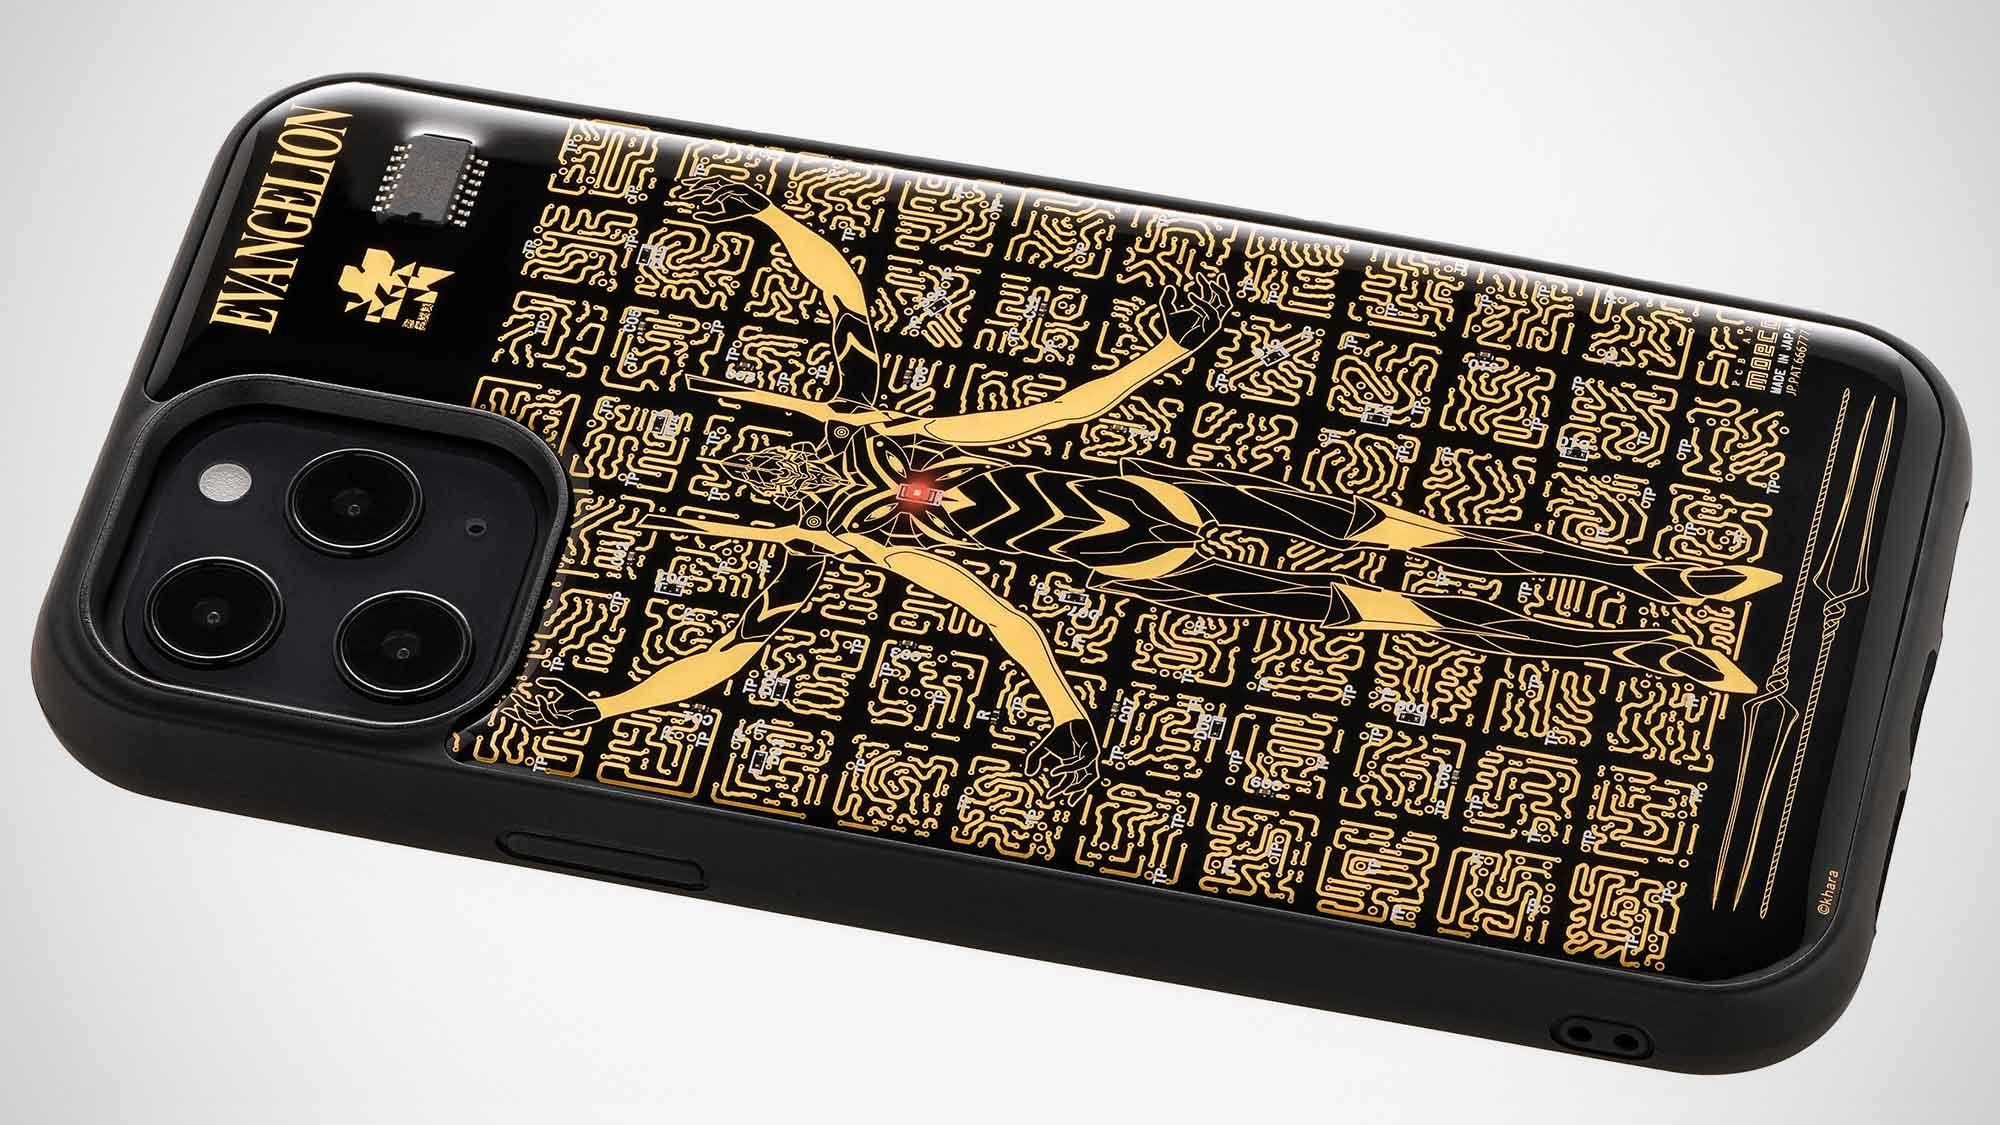 PCB Art moeco Evangelion Light-up iPhone Case